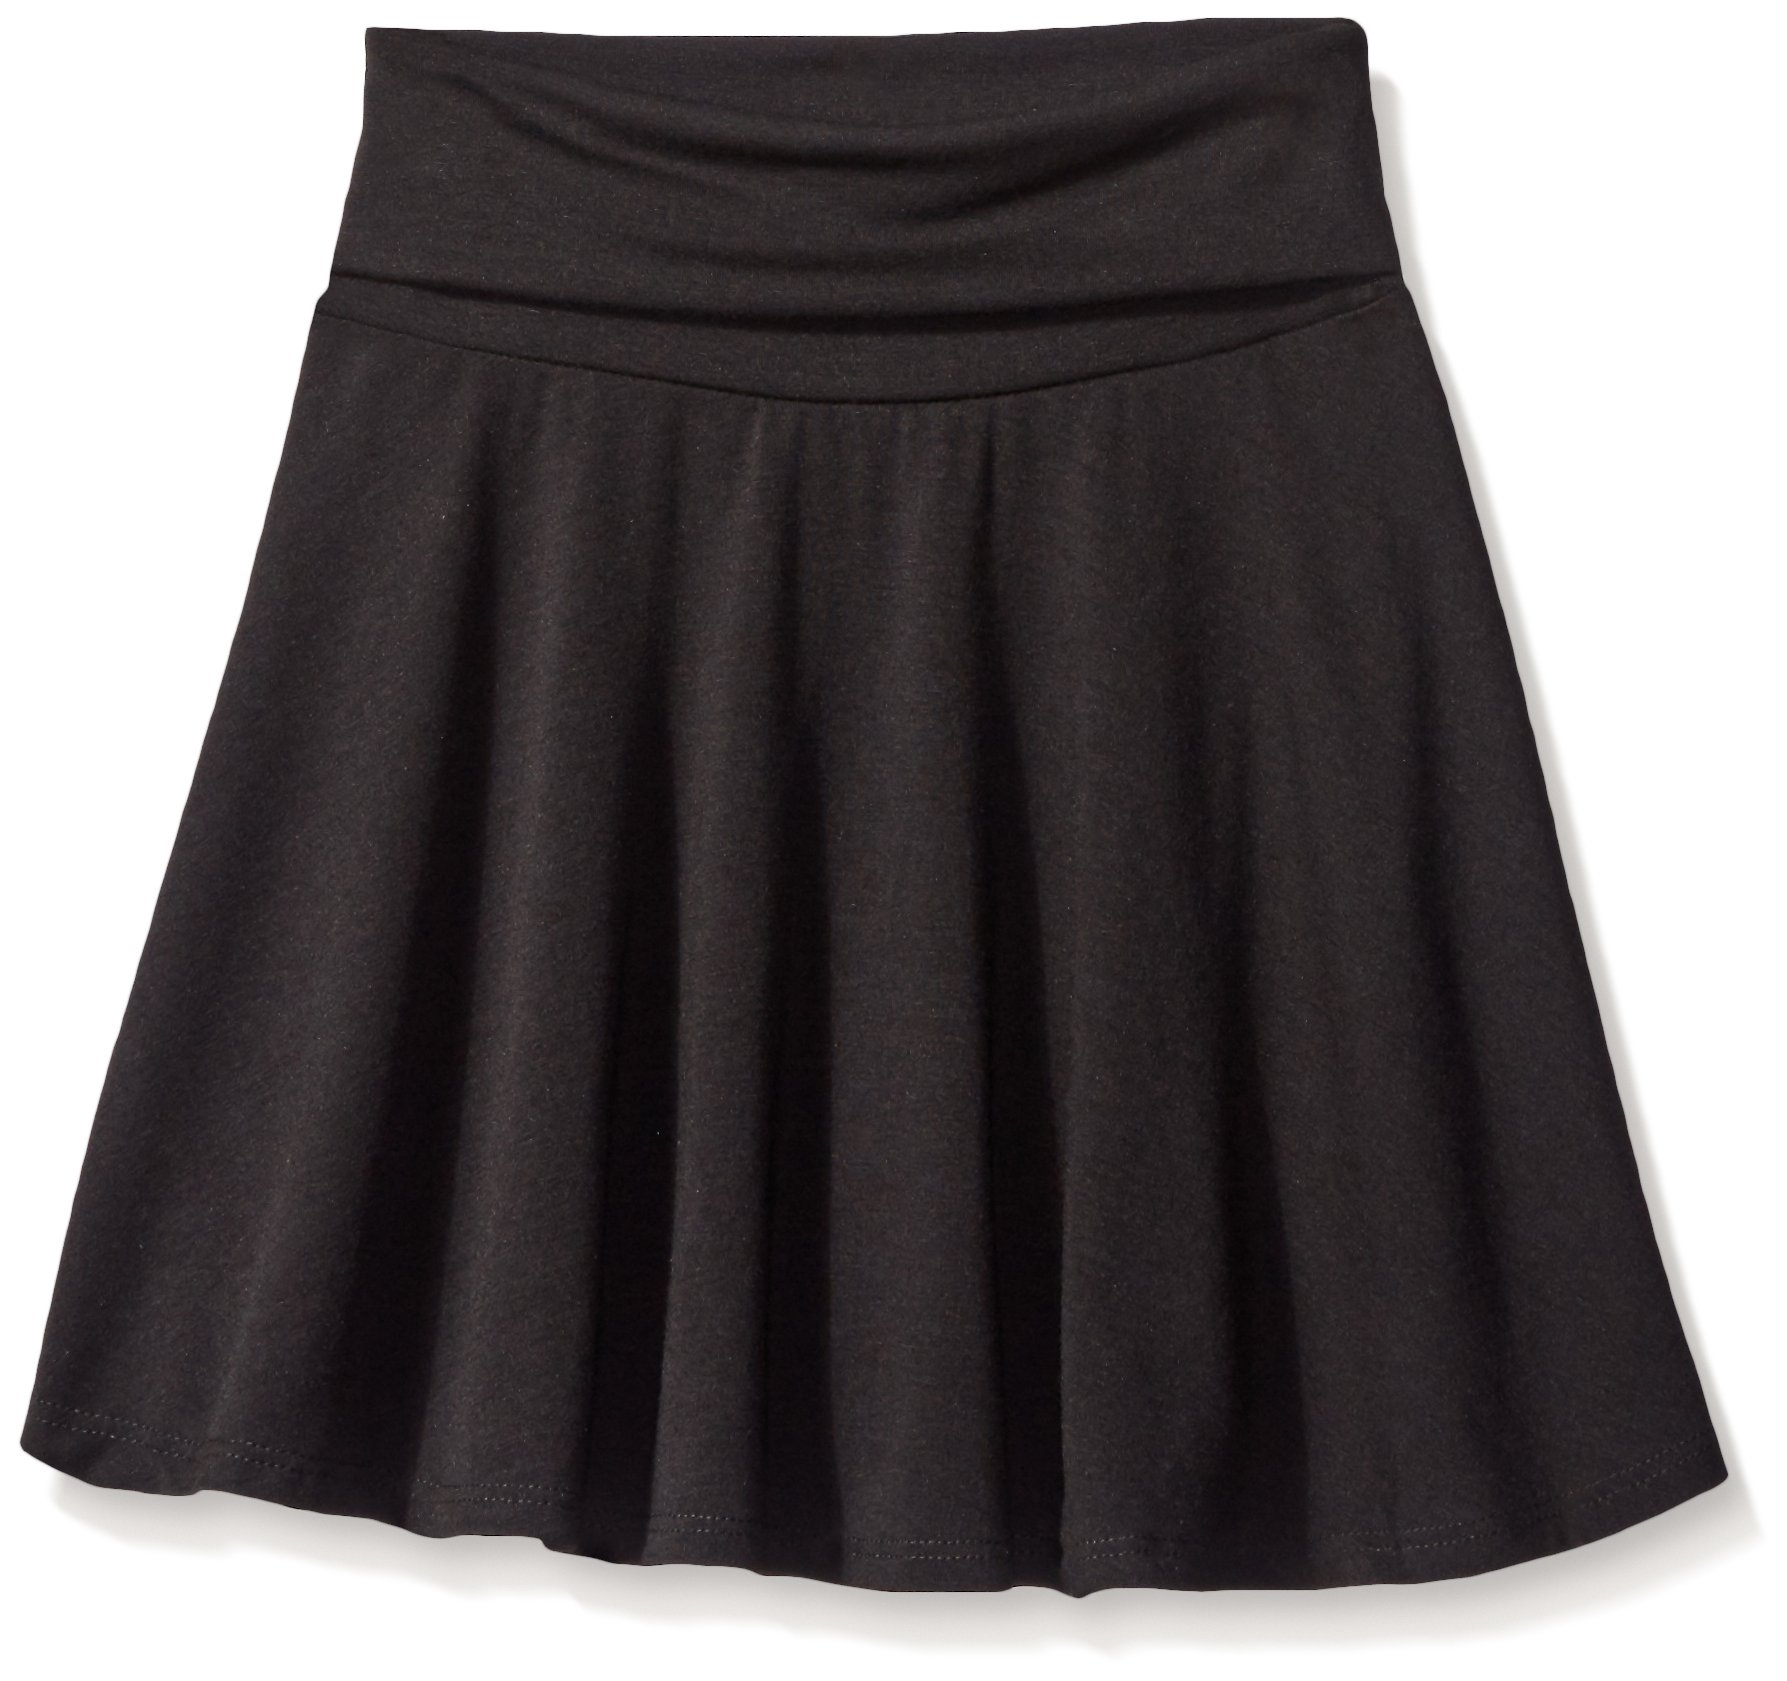 Amy Byer Big Girls' Size 7-16 Knit Skater Skirt with Foldover Waist, Black, Large